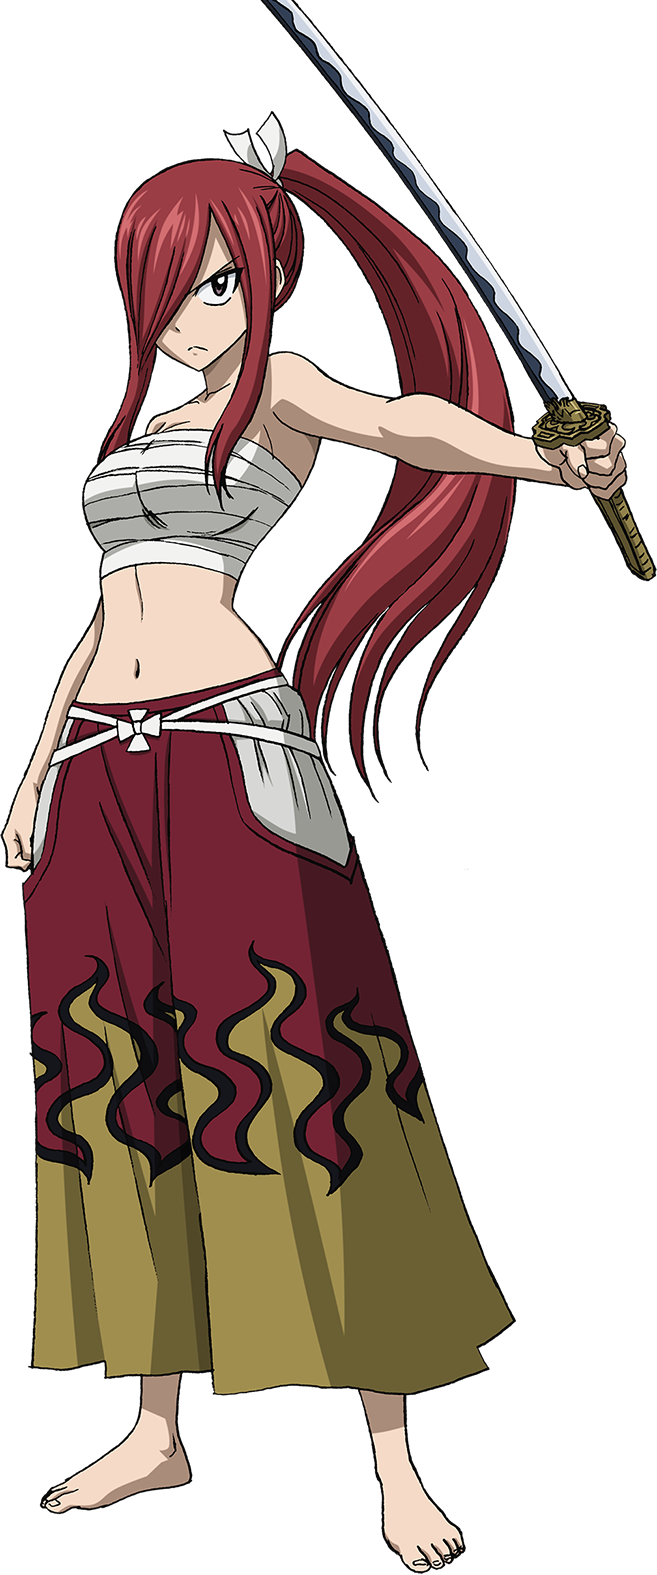 Image erza anime fairy tail wiki fandom - Robe de mariee bustier transparent ...